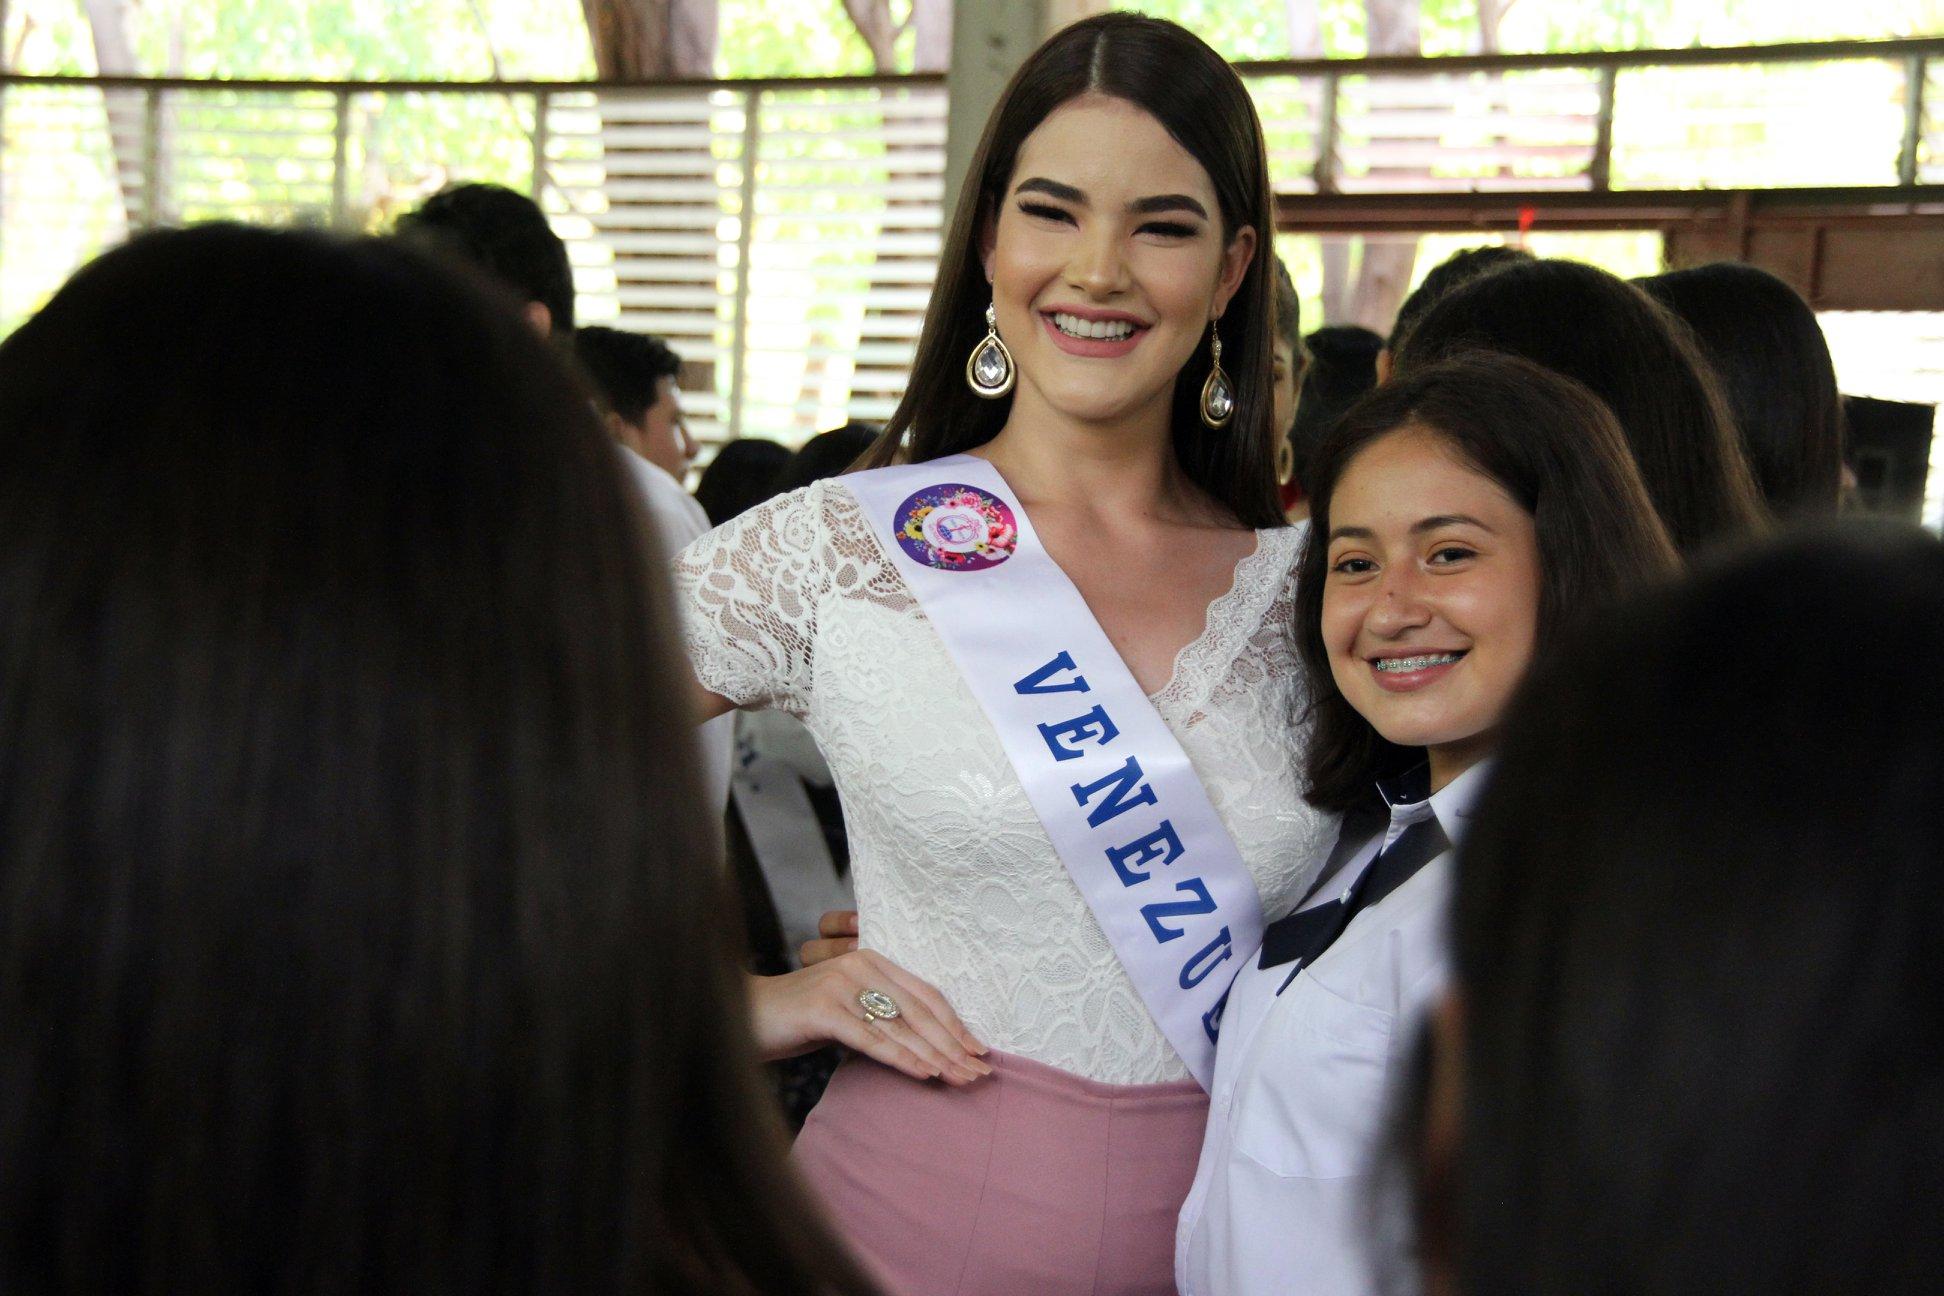 daniela di venere, top 12 de miss teen mundial 2019. - Página 6 60857710